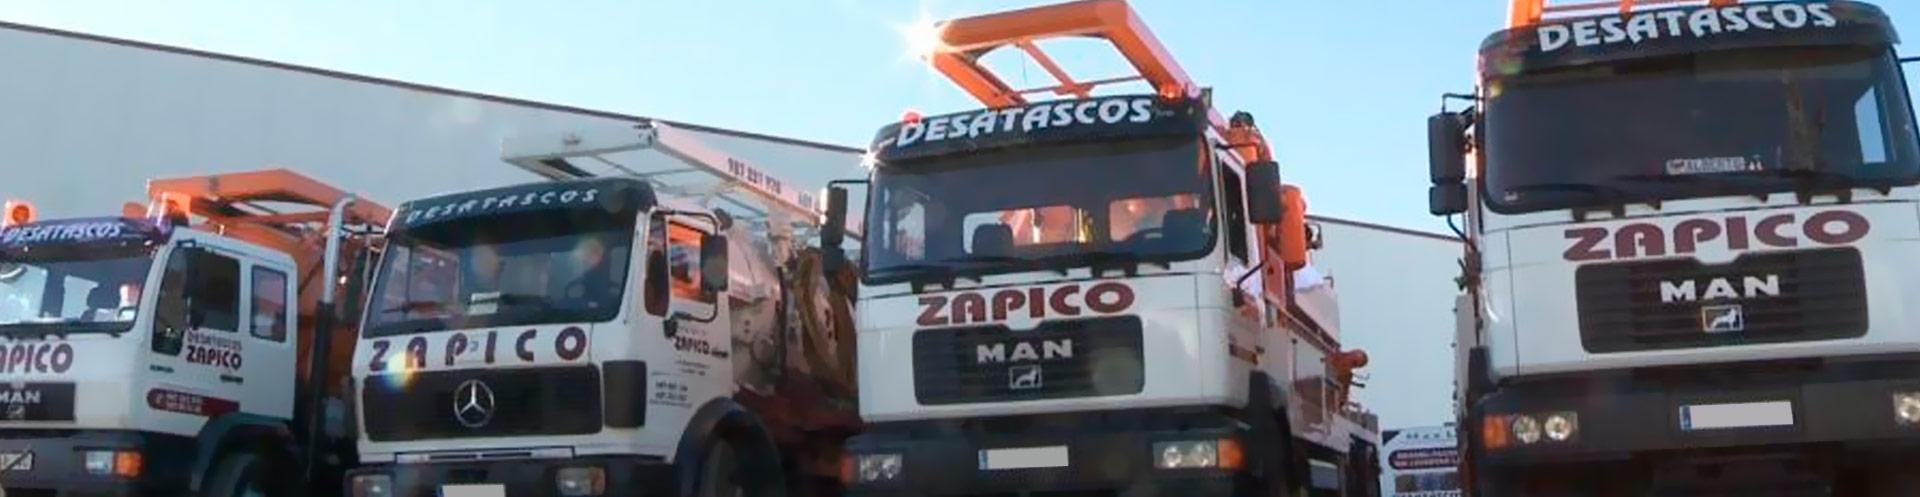 DESATASCOS ZAPICO PATROCINANDO CORNETAS POR ALADINA